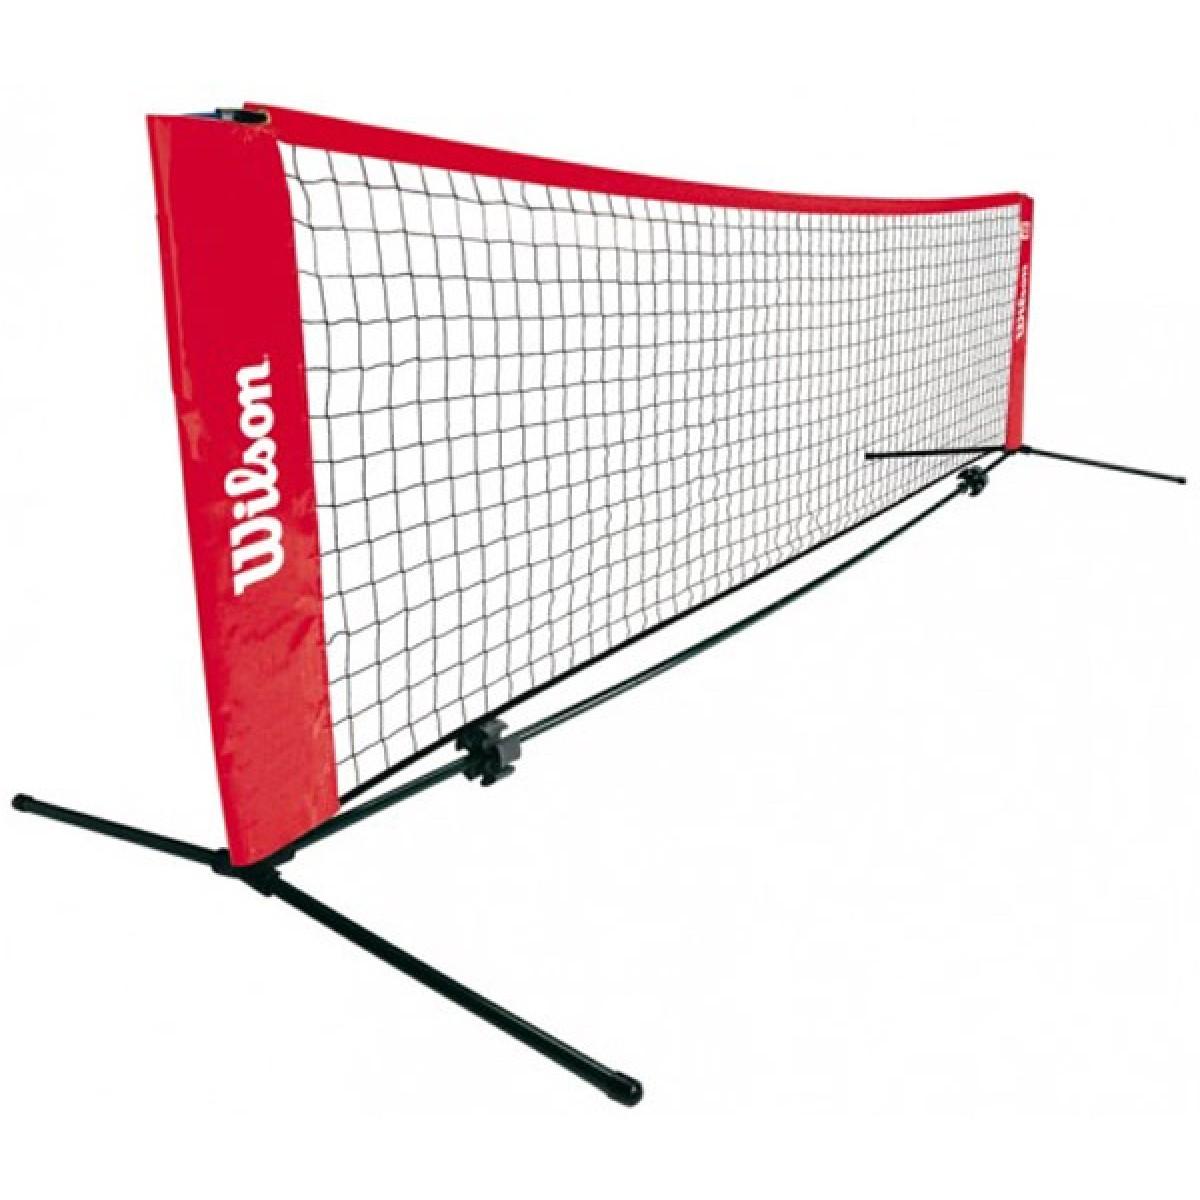 Ensemble Mini Tennis Wilson 6.1 Mètres